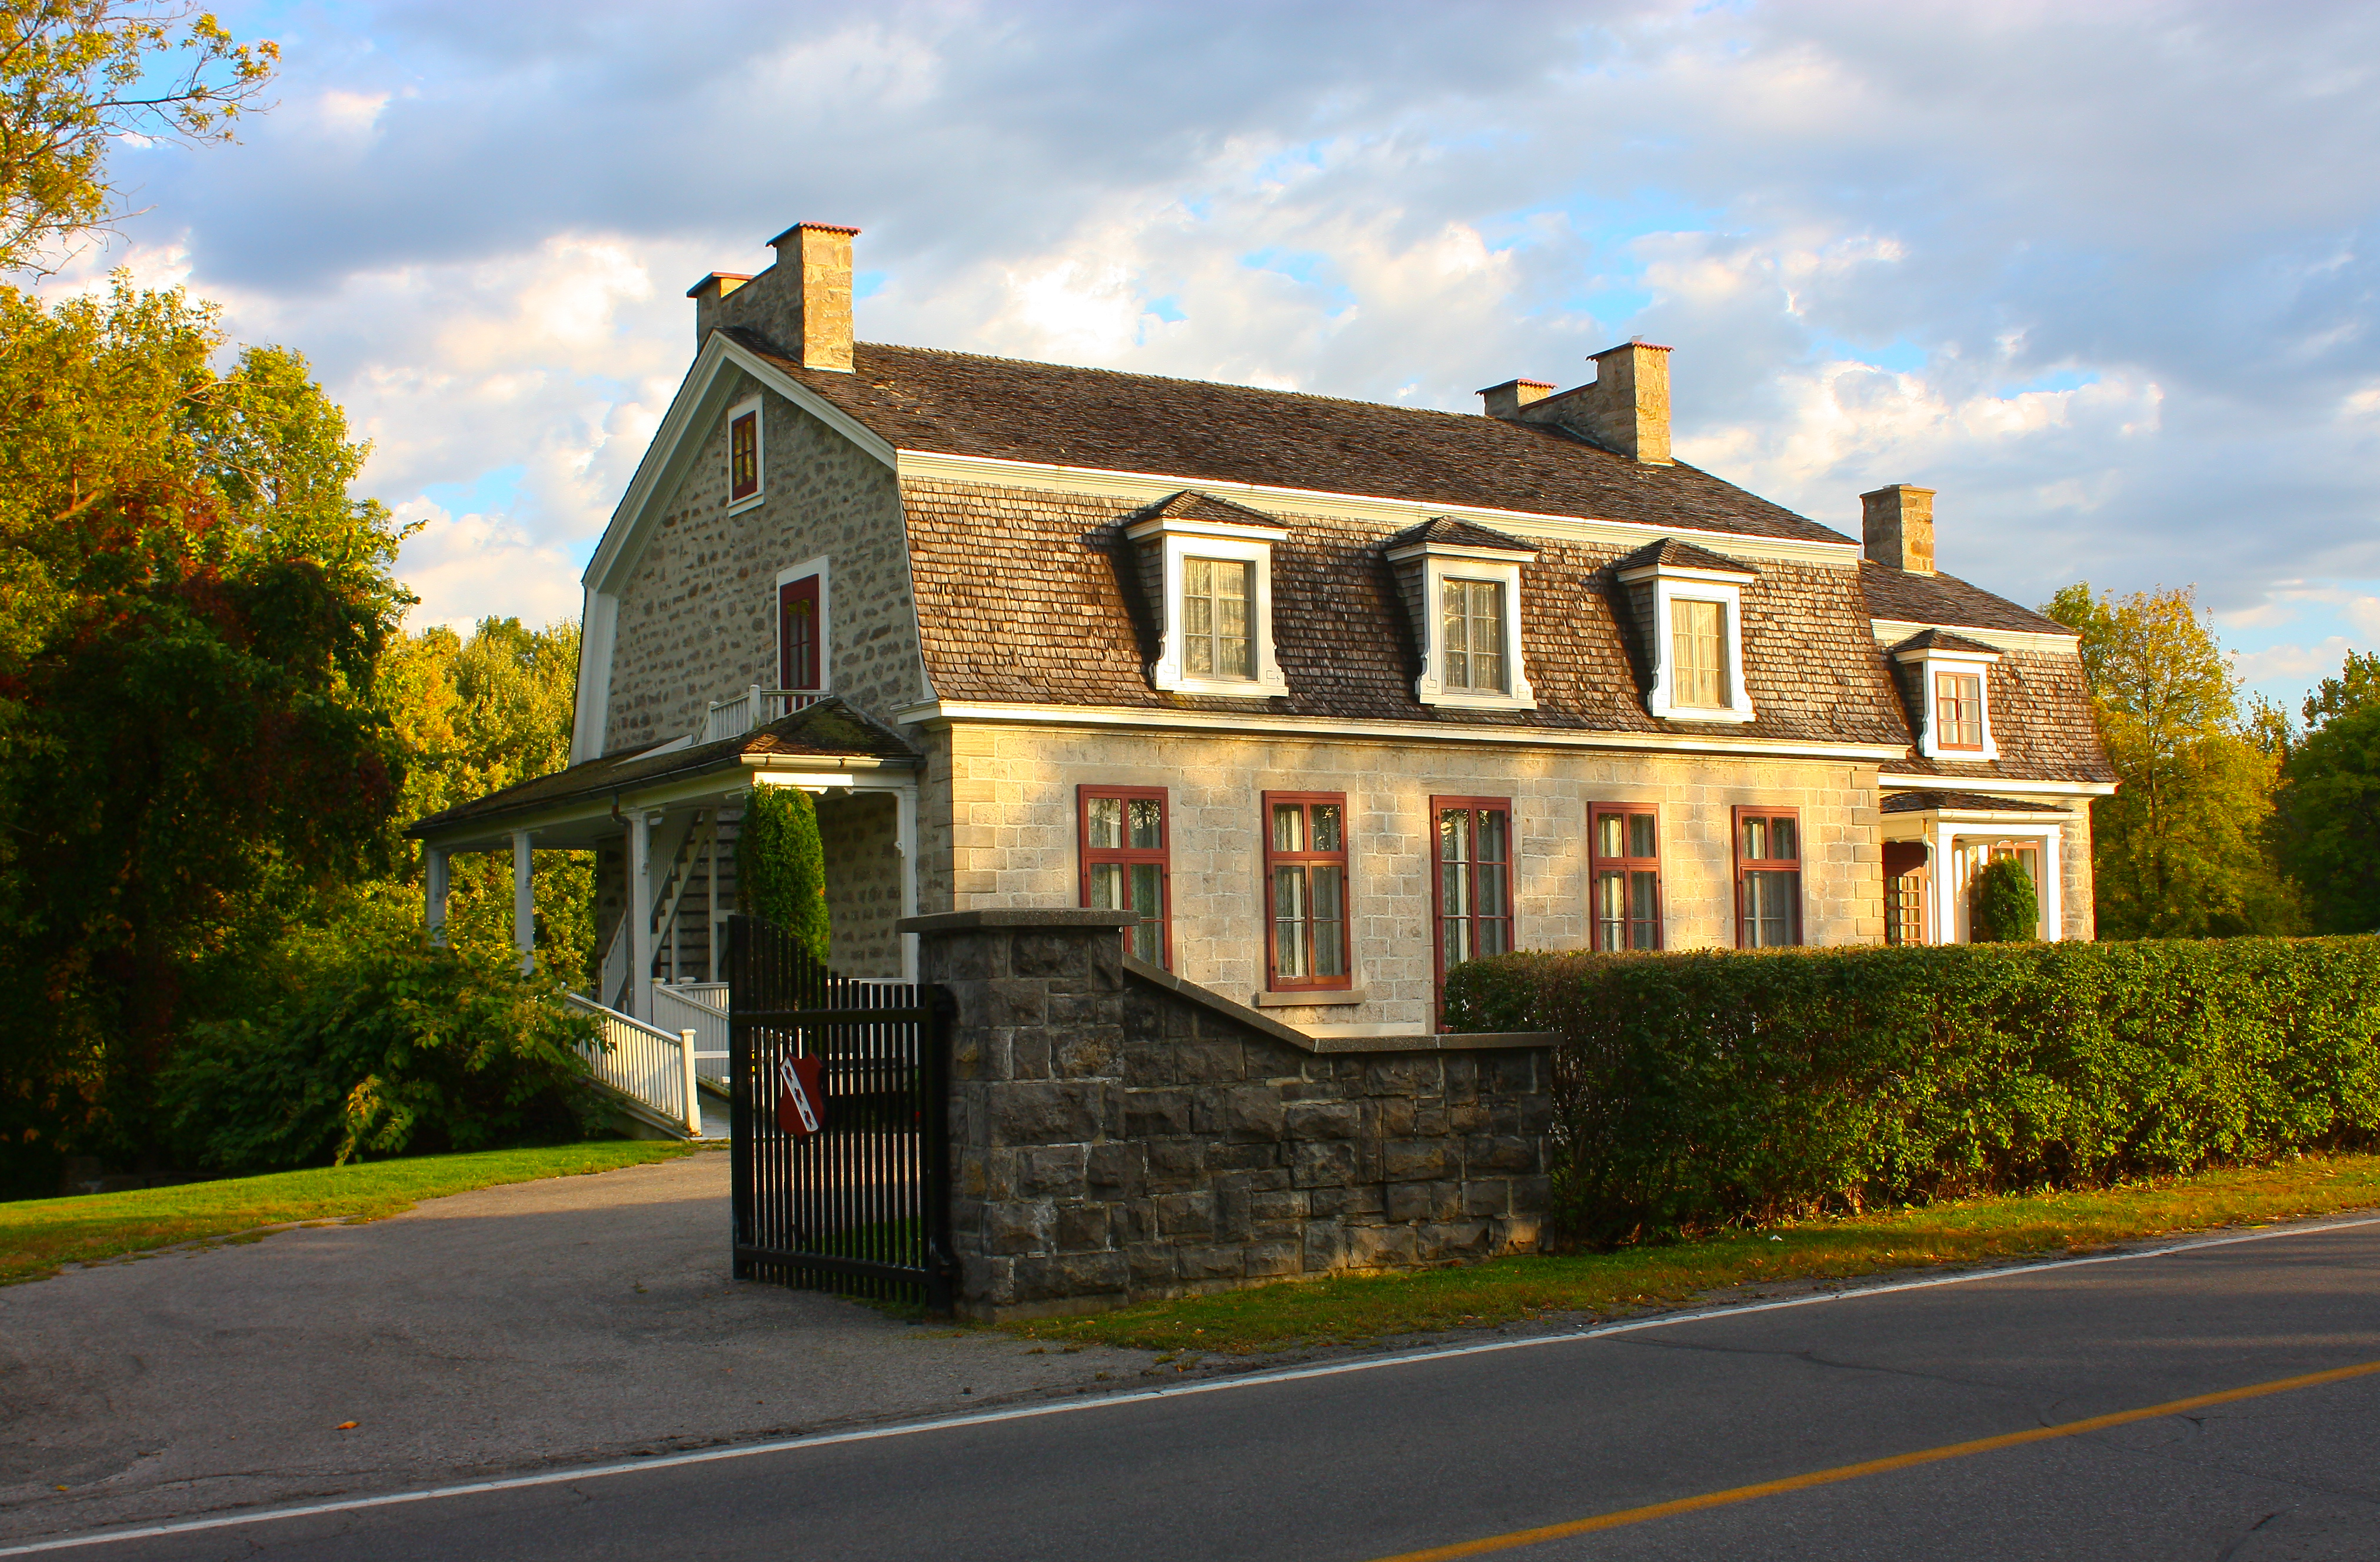 filemaison garth 100 grande cote lorraine canadajpg - Maison Canada